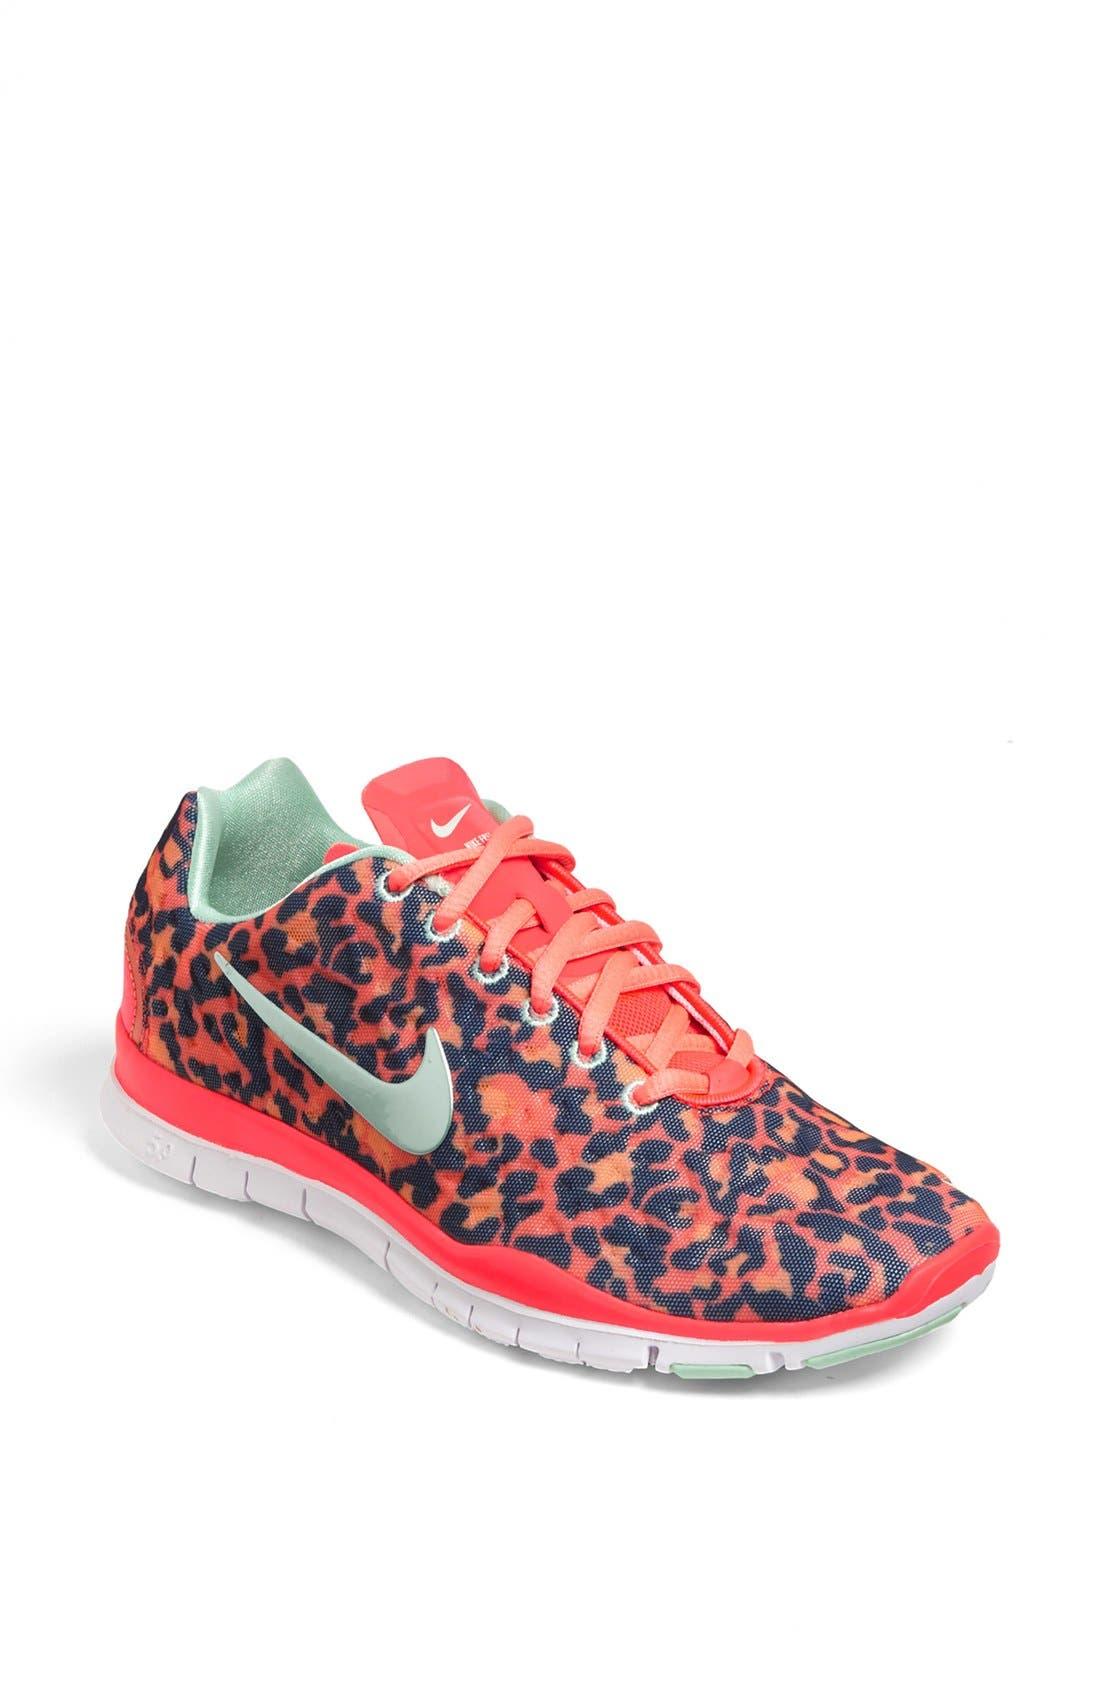 Alternate Image 1 Selected - Nike 'Free TR Fit 3 Print' Training Shoe (Women)